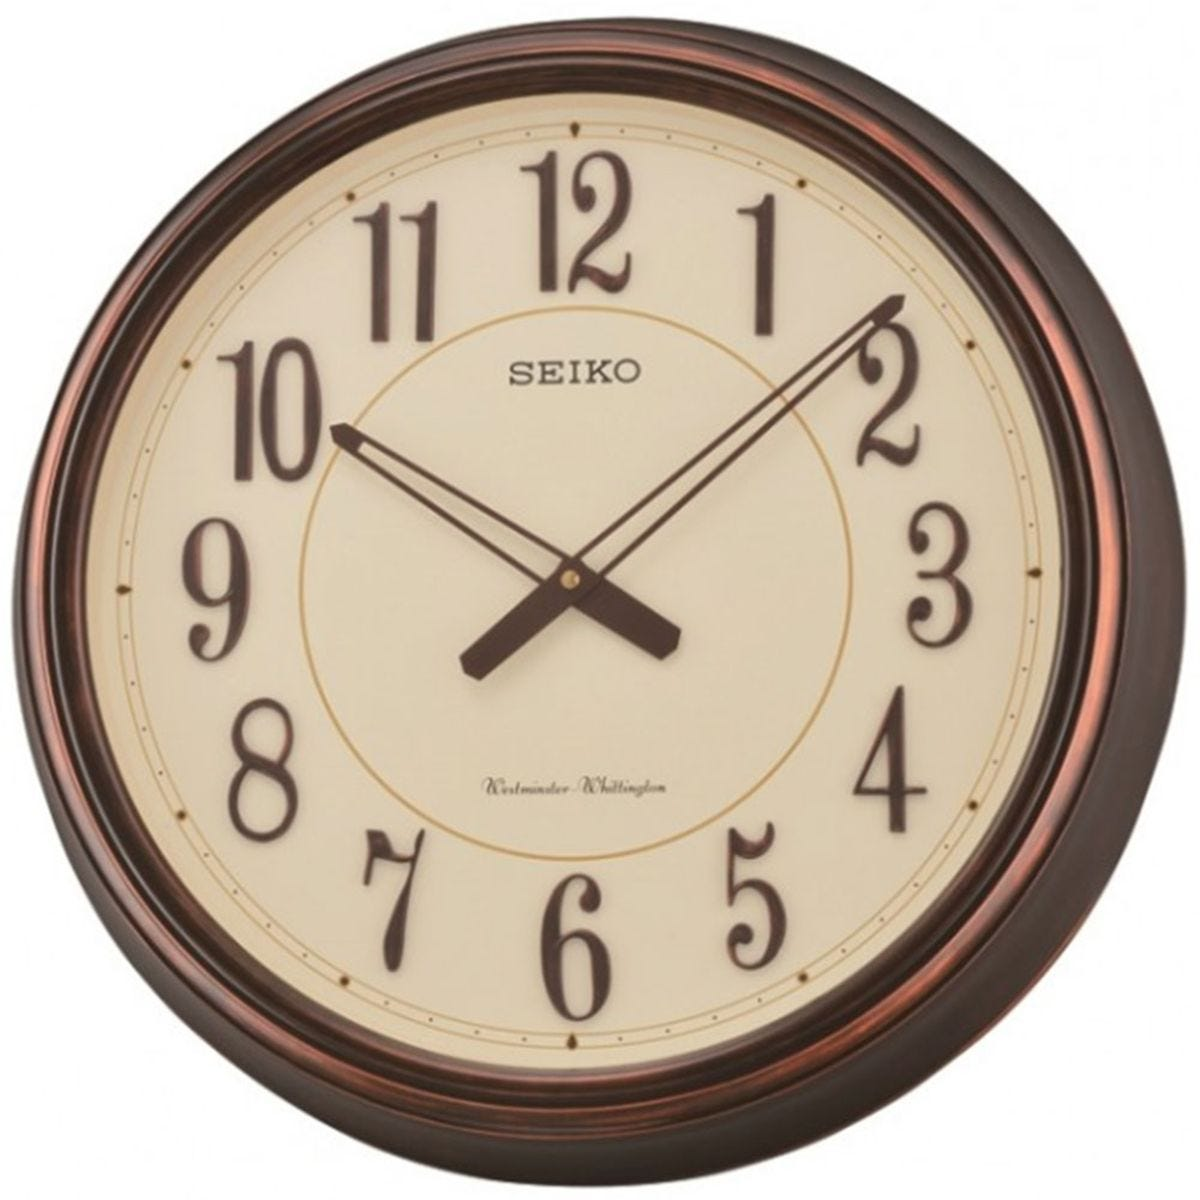 Seiko Westminster/Whittington Dual Chimes Wall Clock - Dark Brown